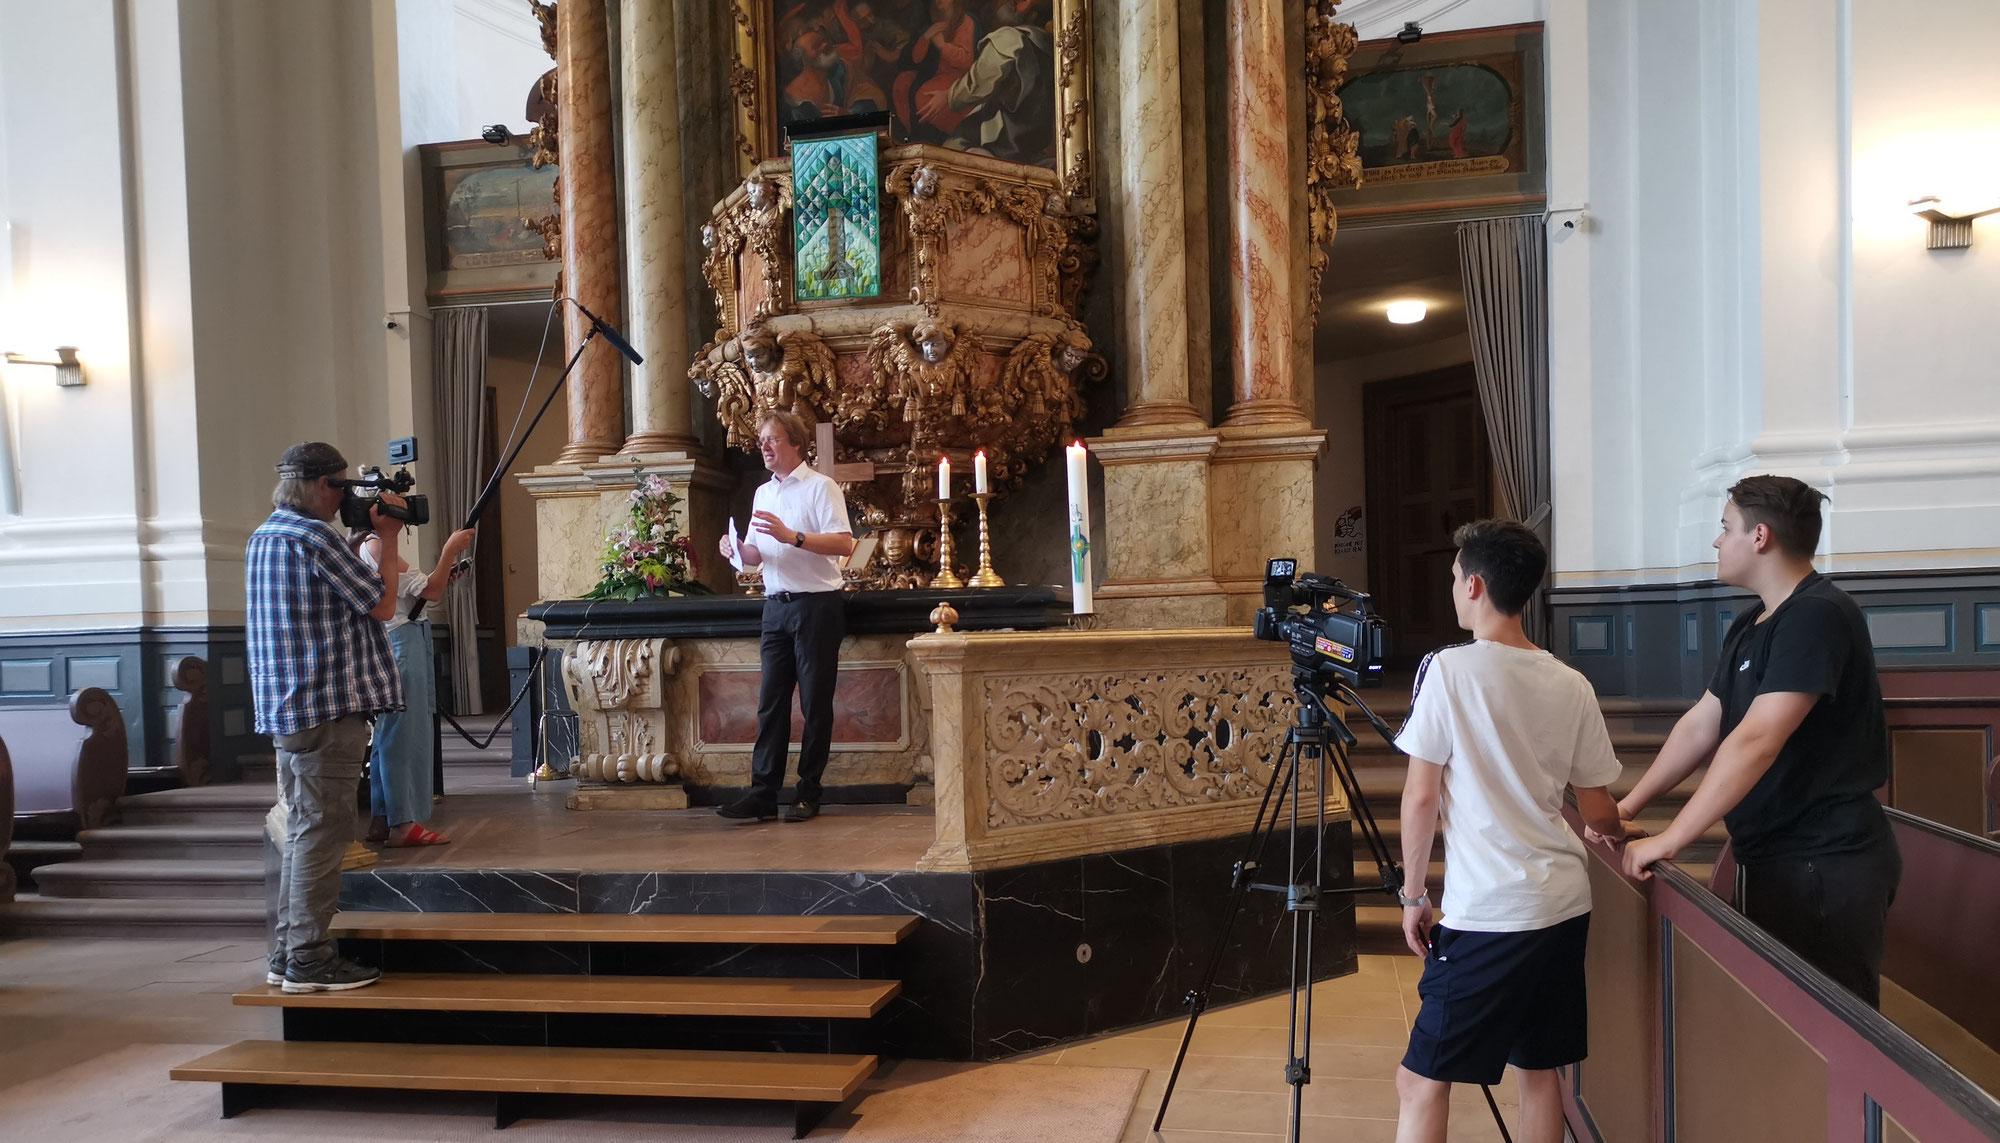 Video-Kirchenführung durch die Weilburger Schlosskirche